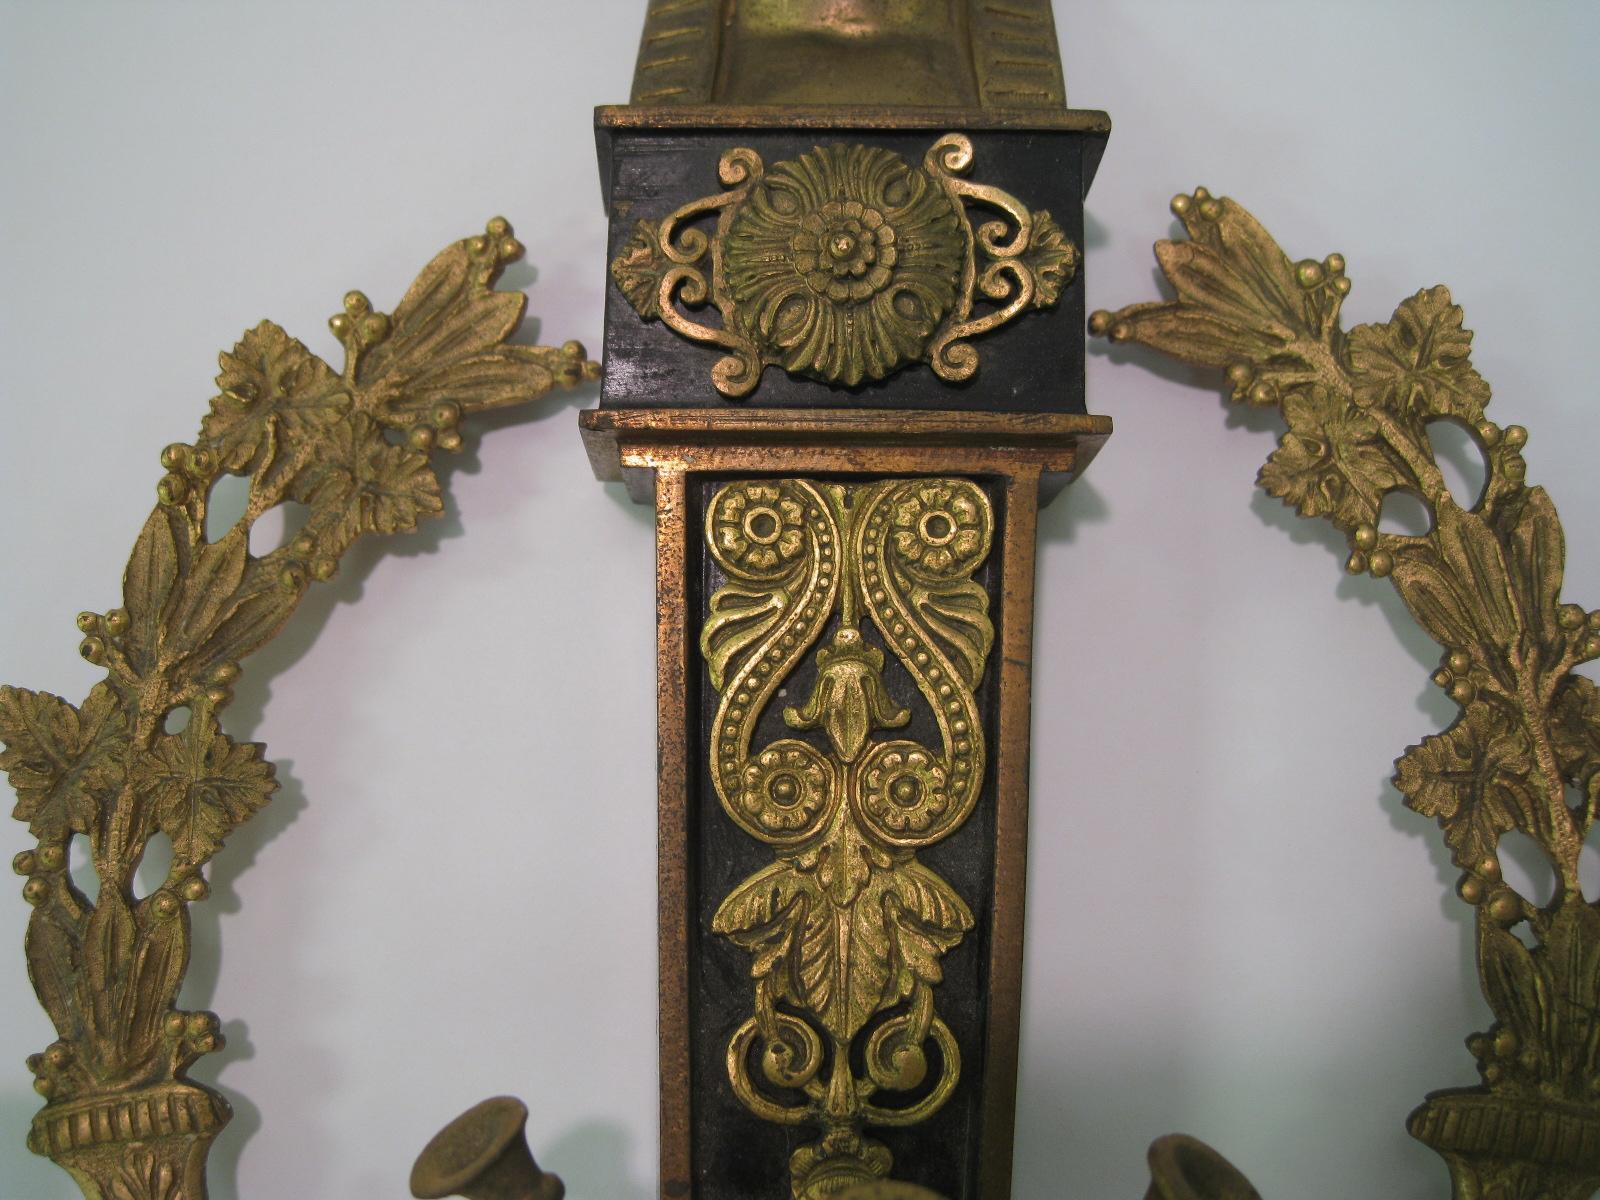 Antiques art and collectibles antique lamps antique egyptian antique lamps antique egyptian wall sconces c amipublicfo Image collections